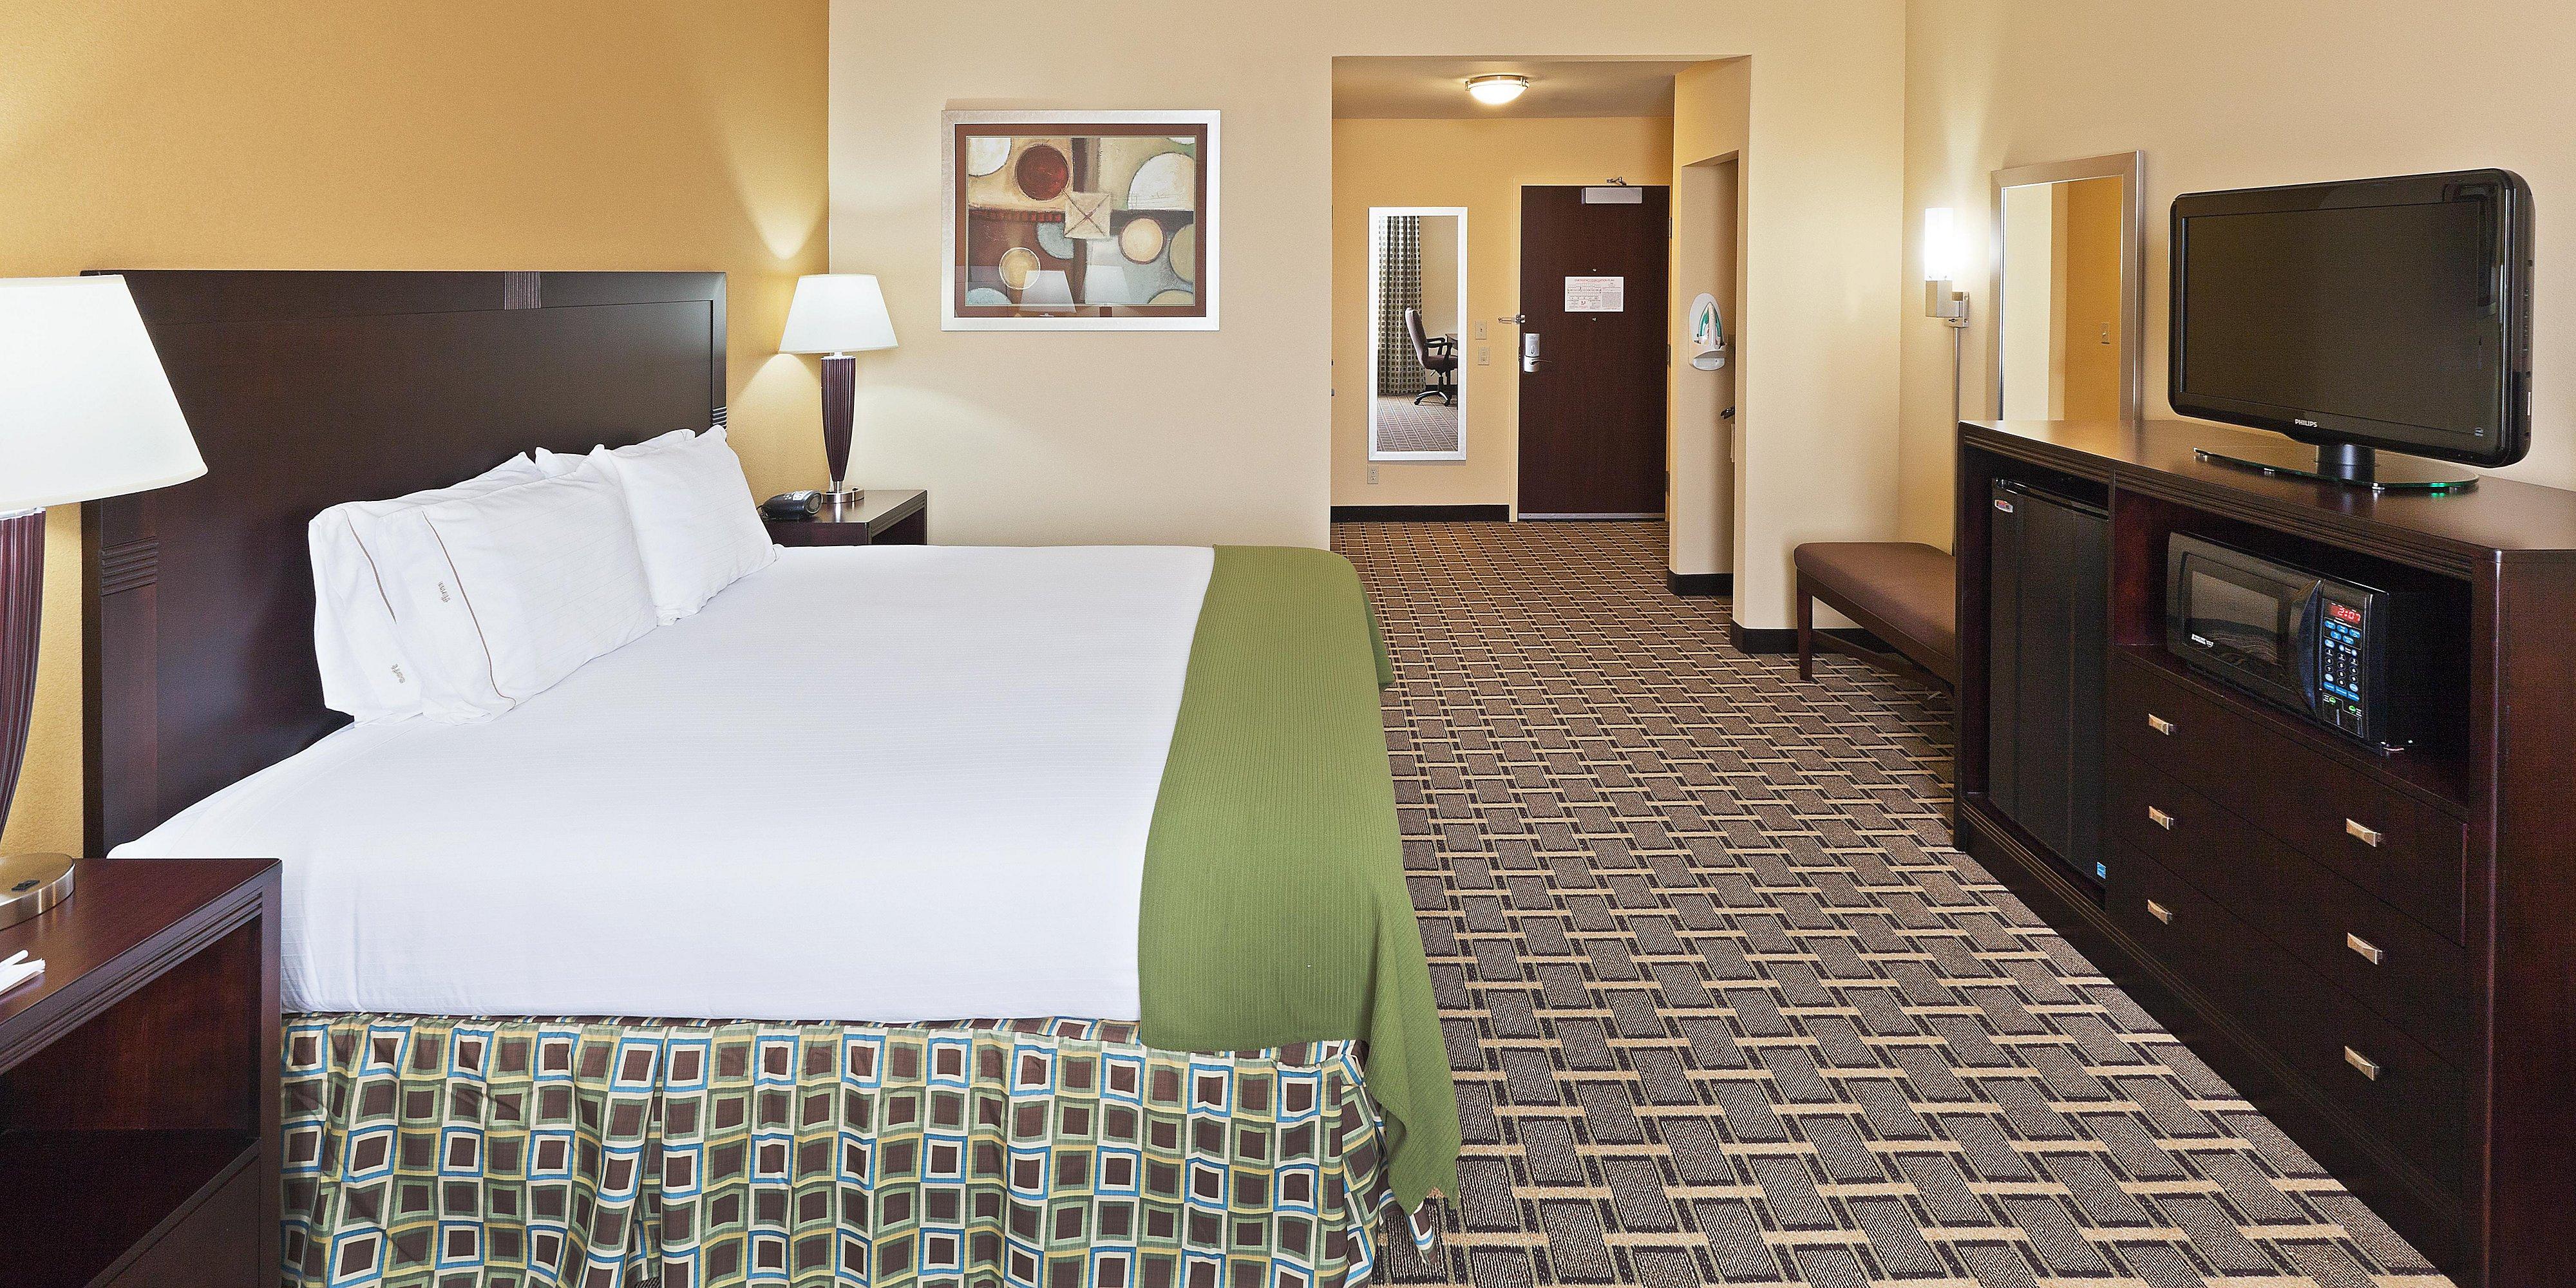 Holiday Inn Express & Suites El Paso West IHG Hotel